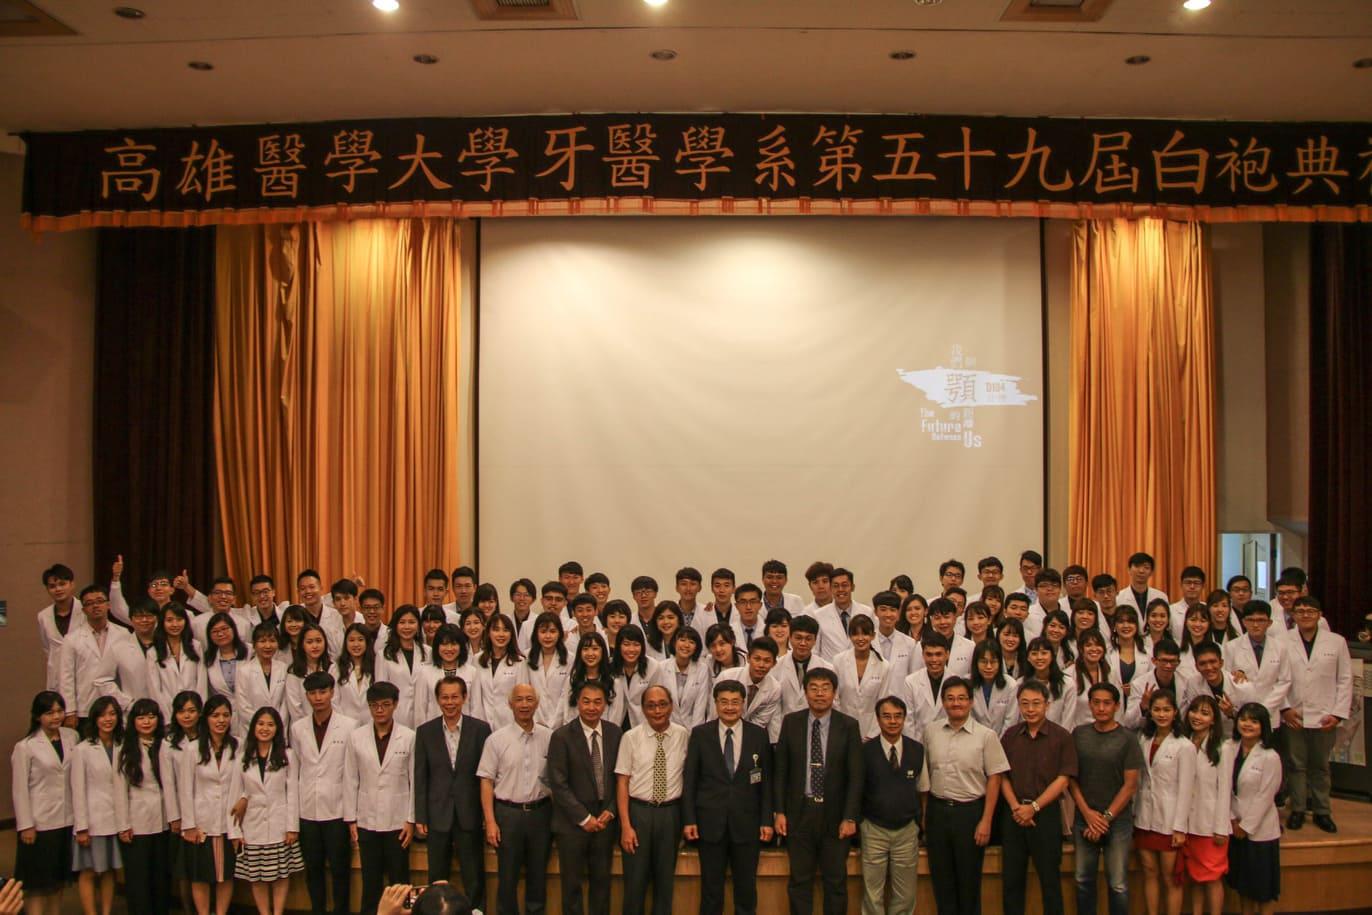 KMU-D104-59thWhite_Coat_Ceremony